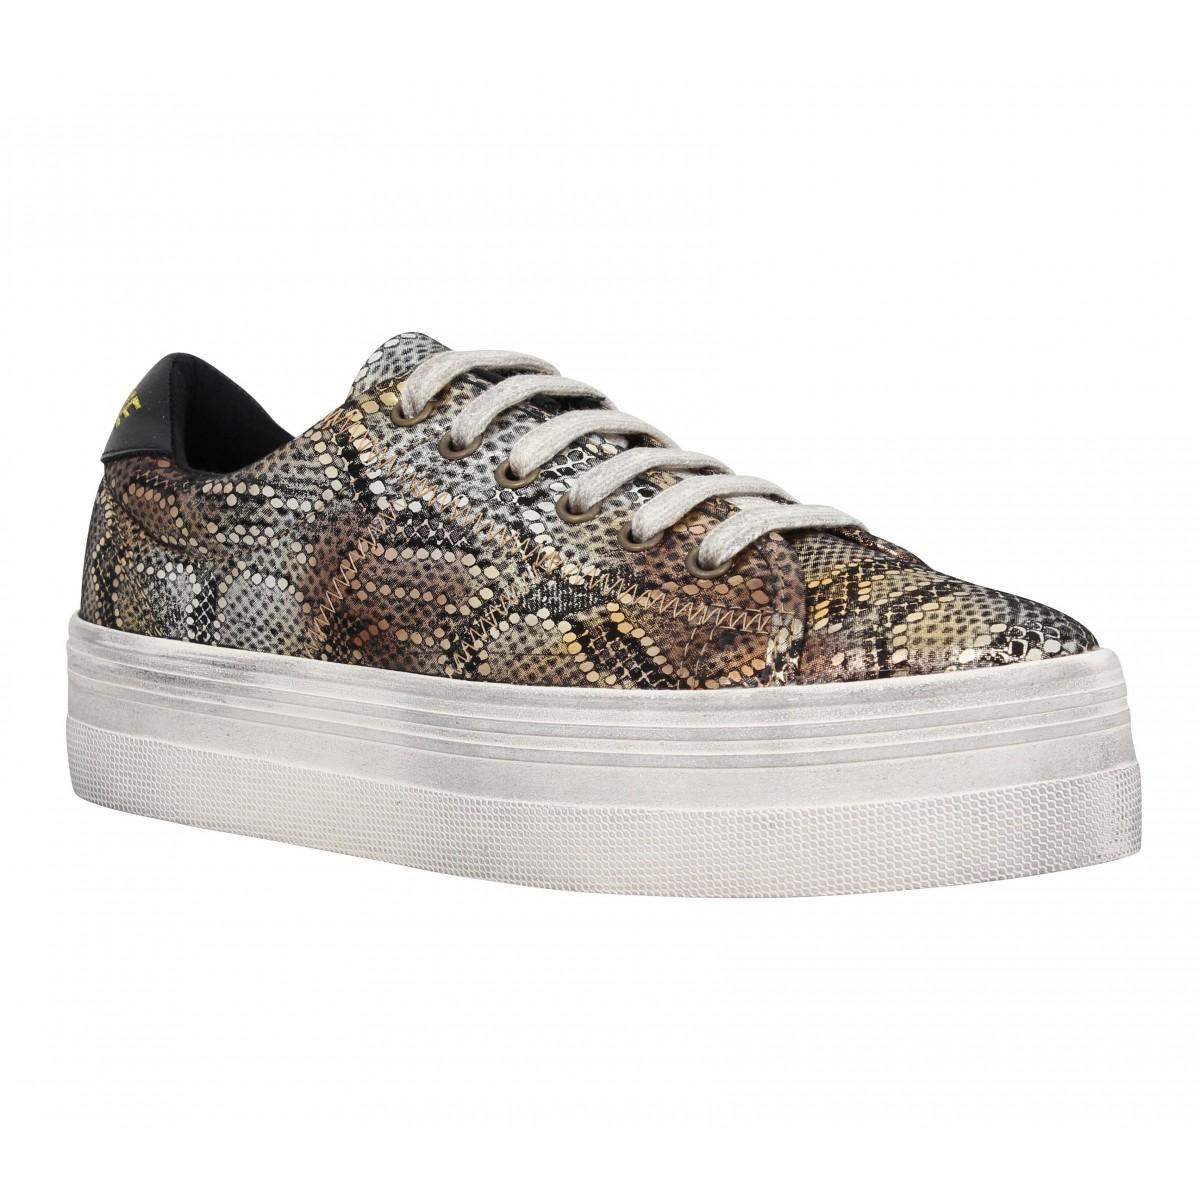 Compensées NO NAME Plato Sneaker shiny snake Femme Bronze